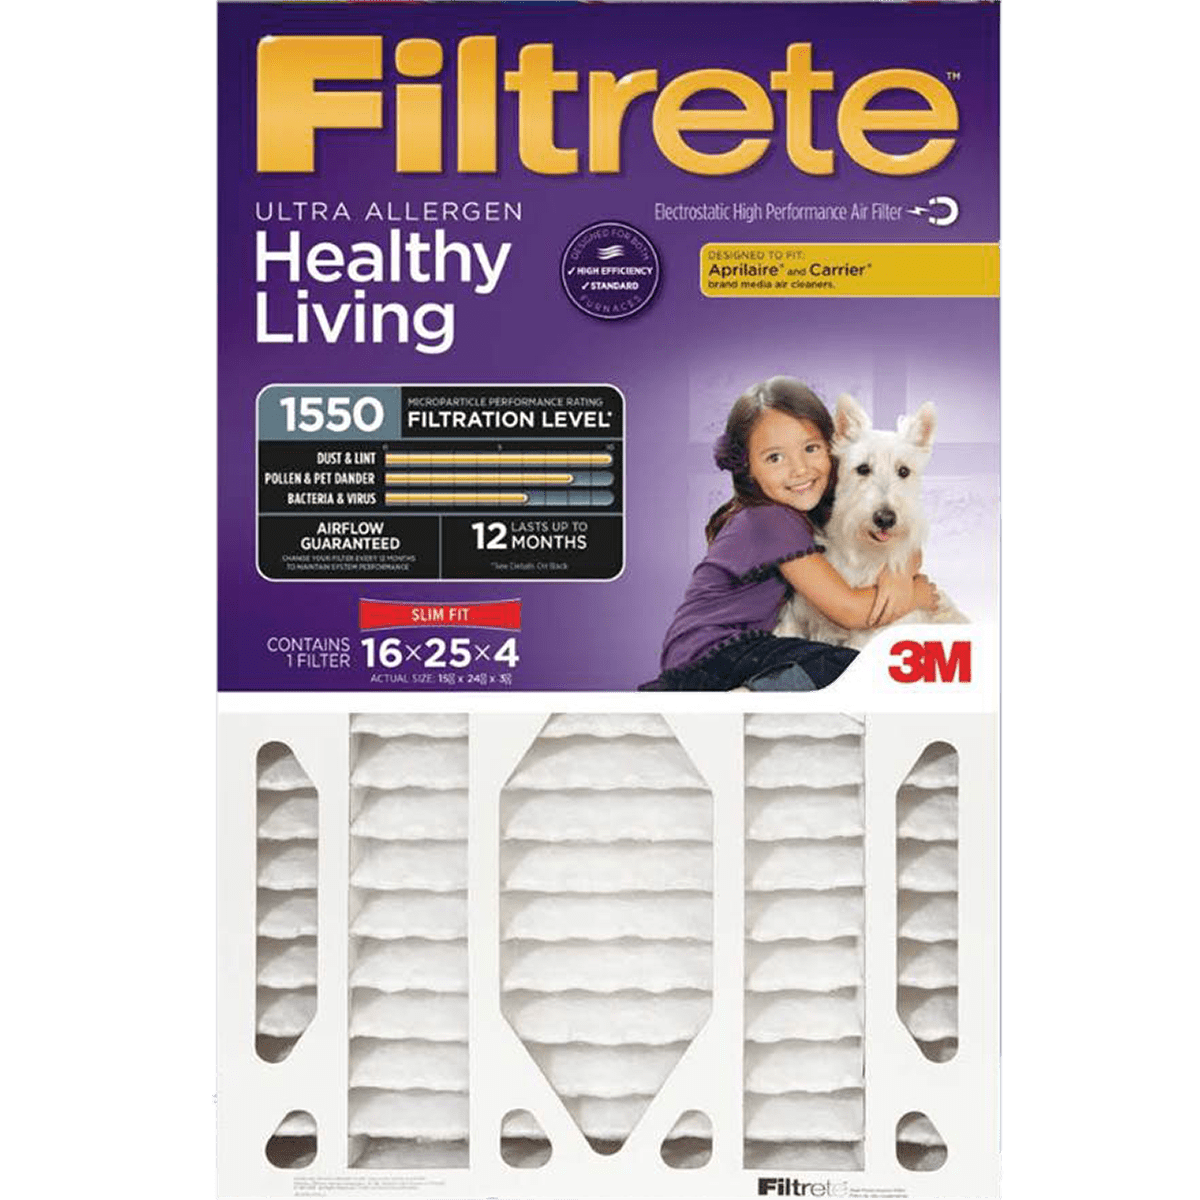 3m filtrete healthy living ultra allergen mpr slim fit filters - Filtrete Air Filter